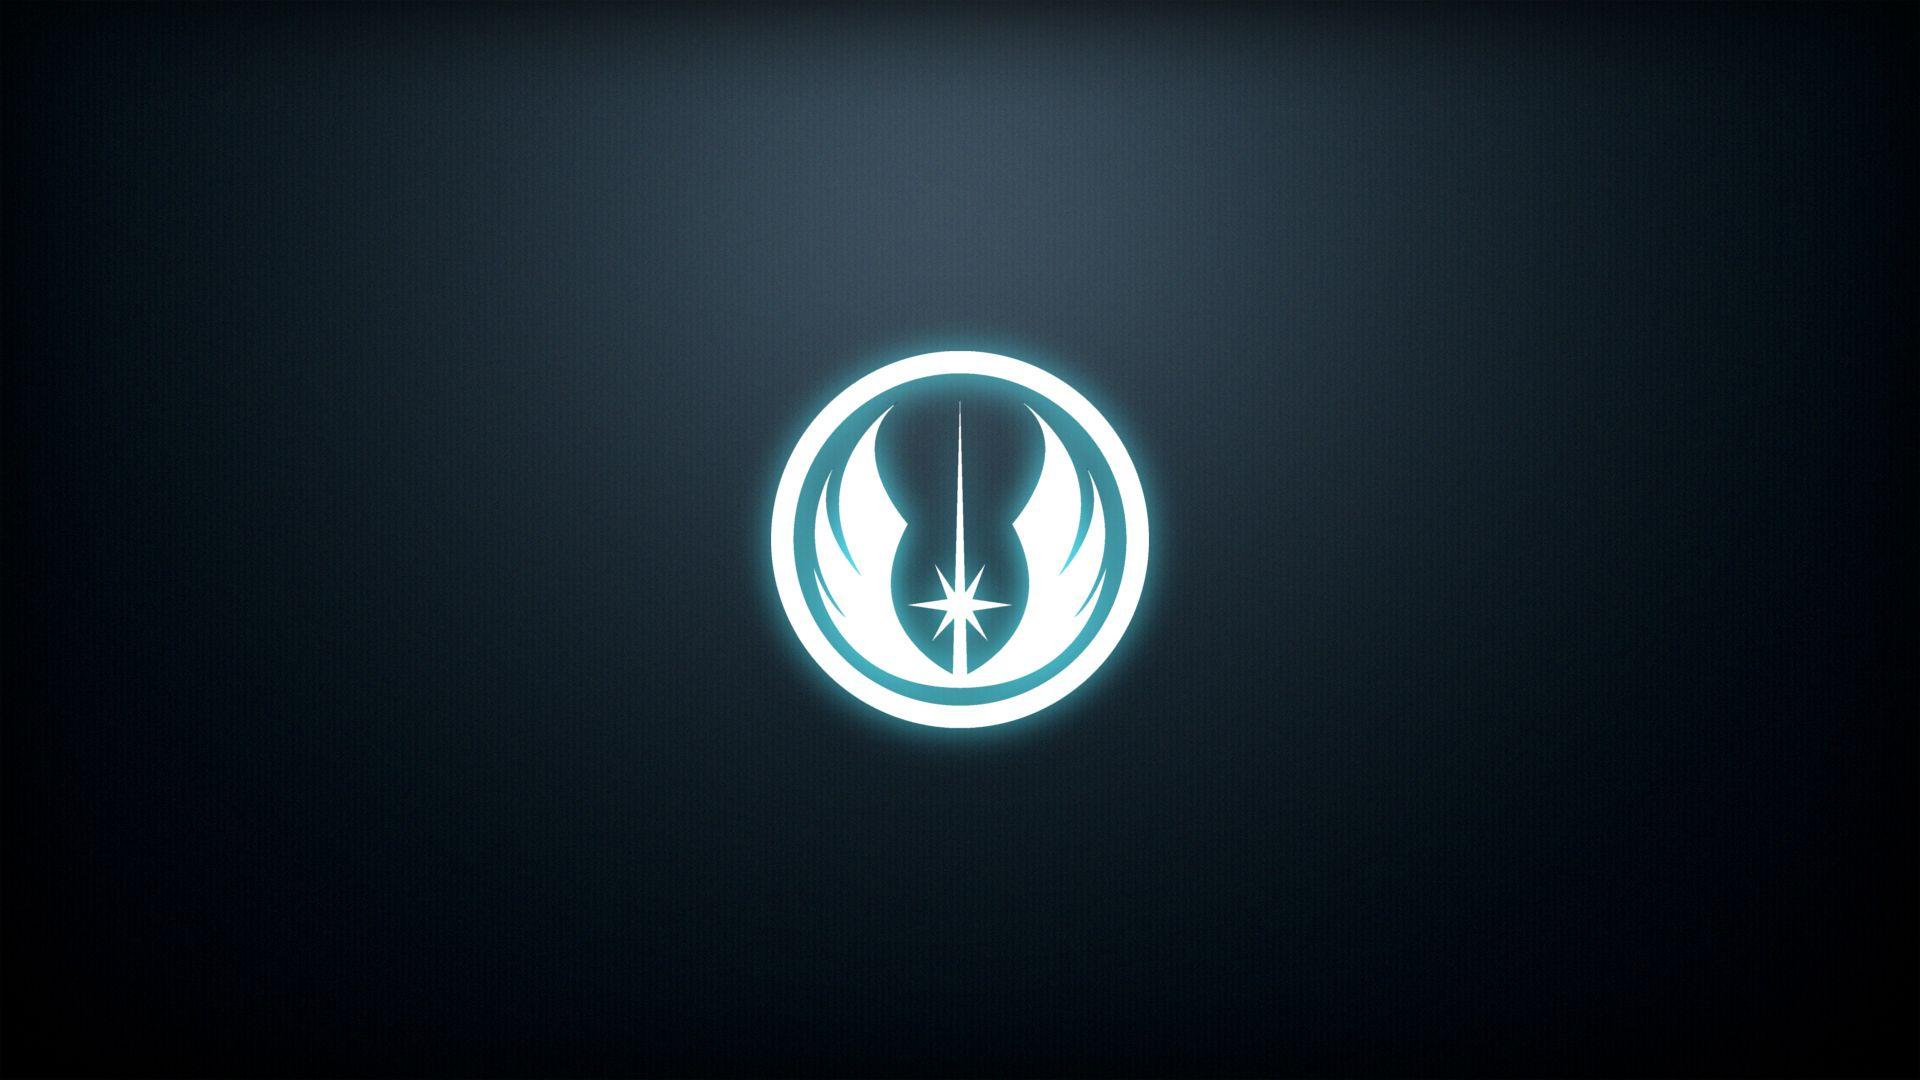 48 Jedi Symbol Wallpaper On Wallpapersafari